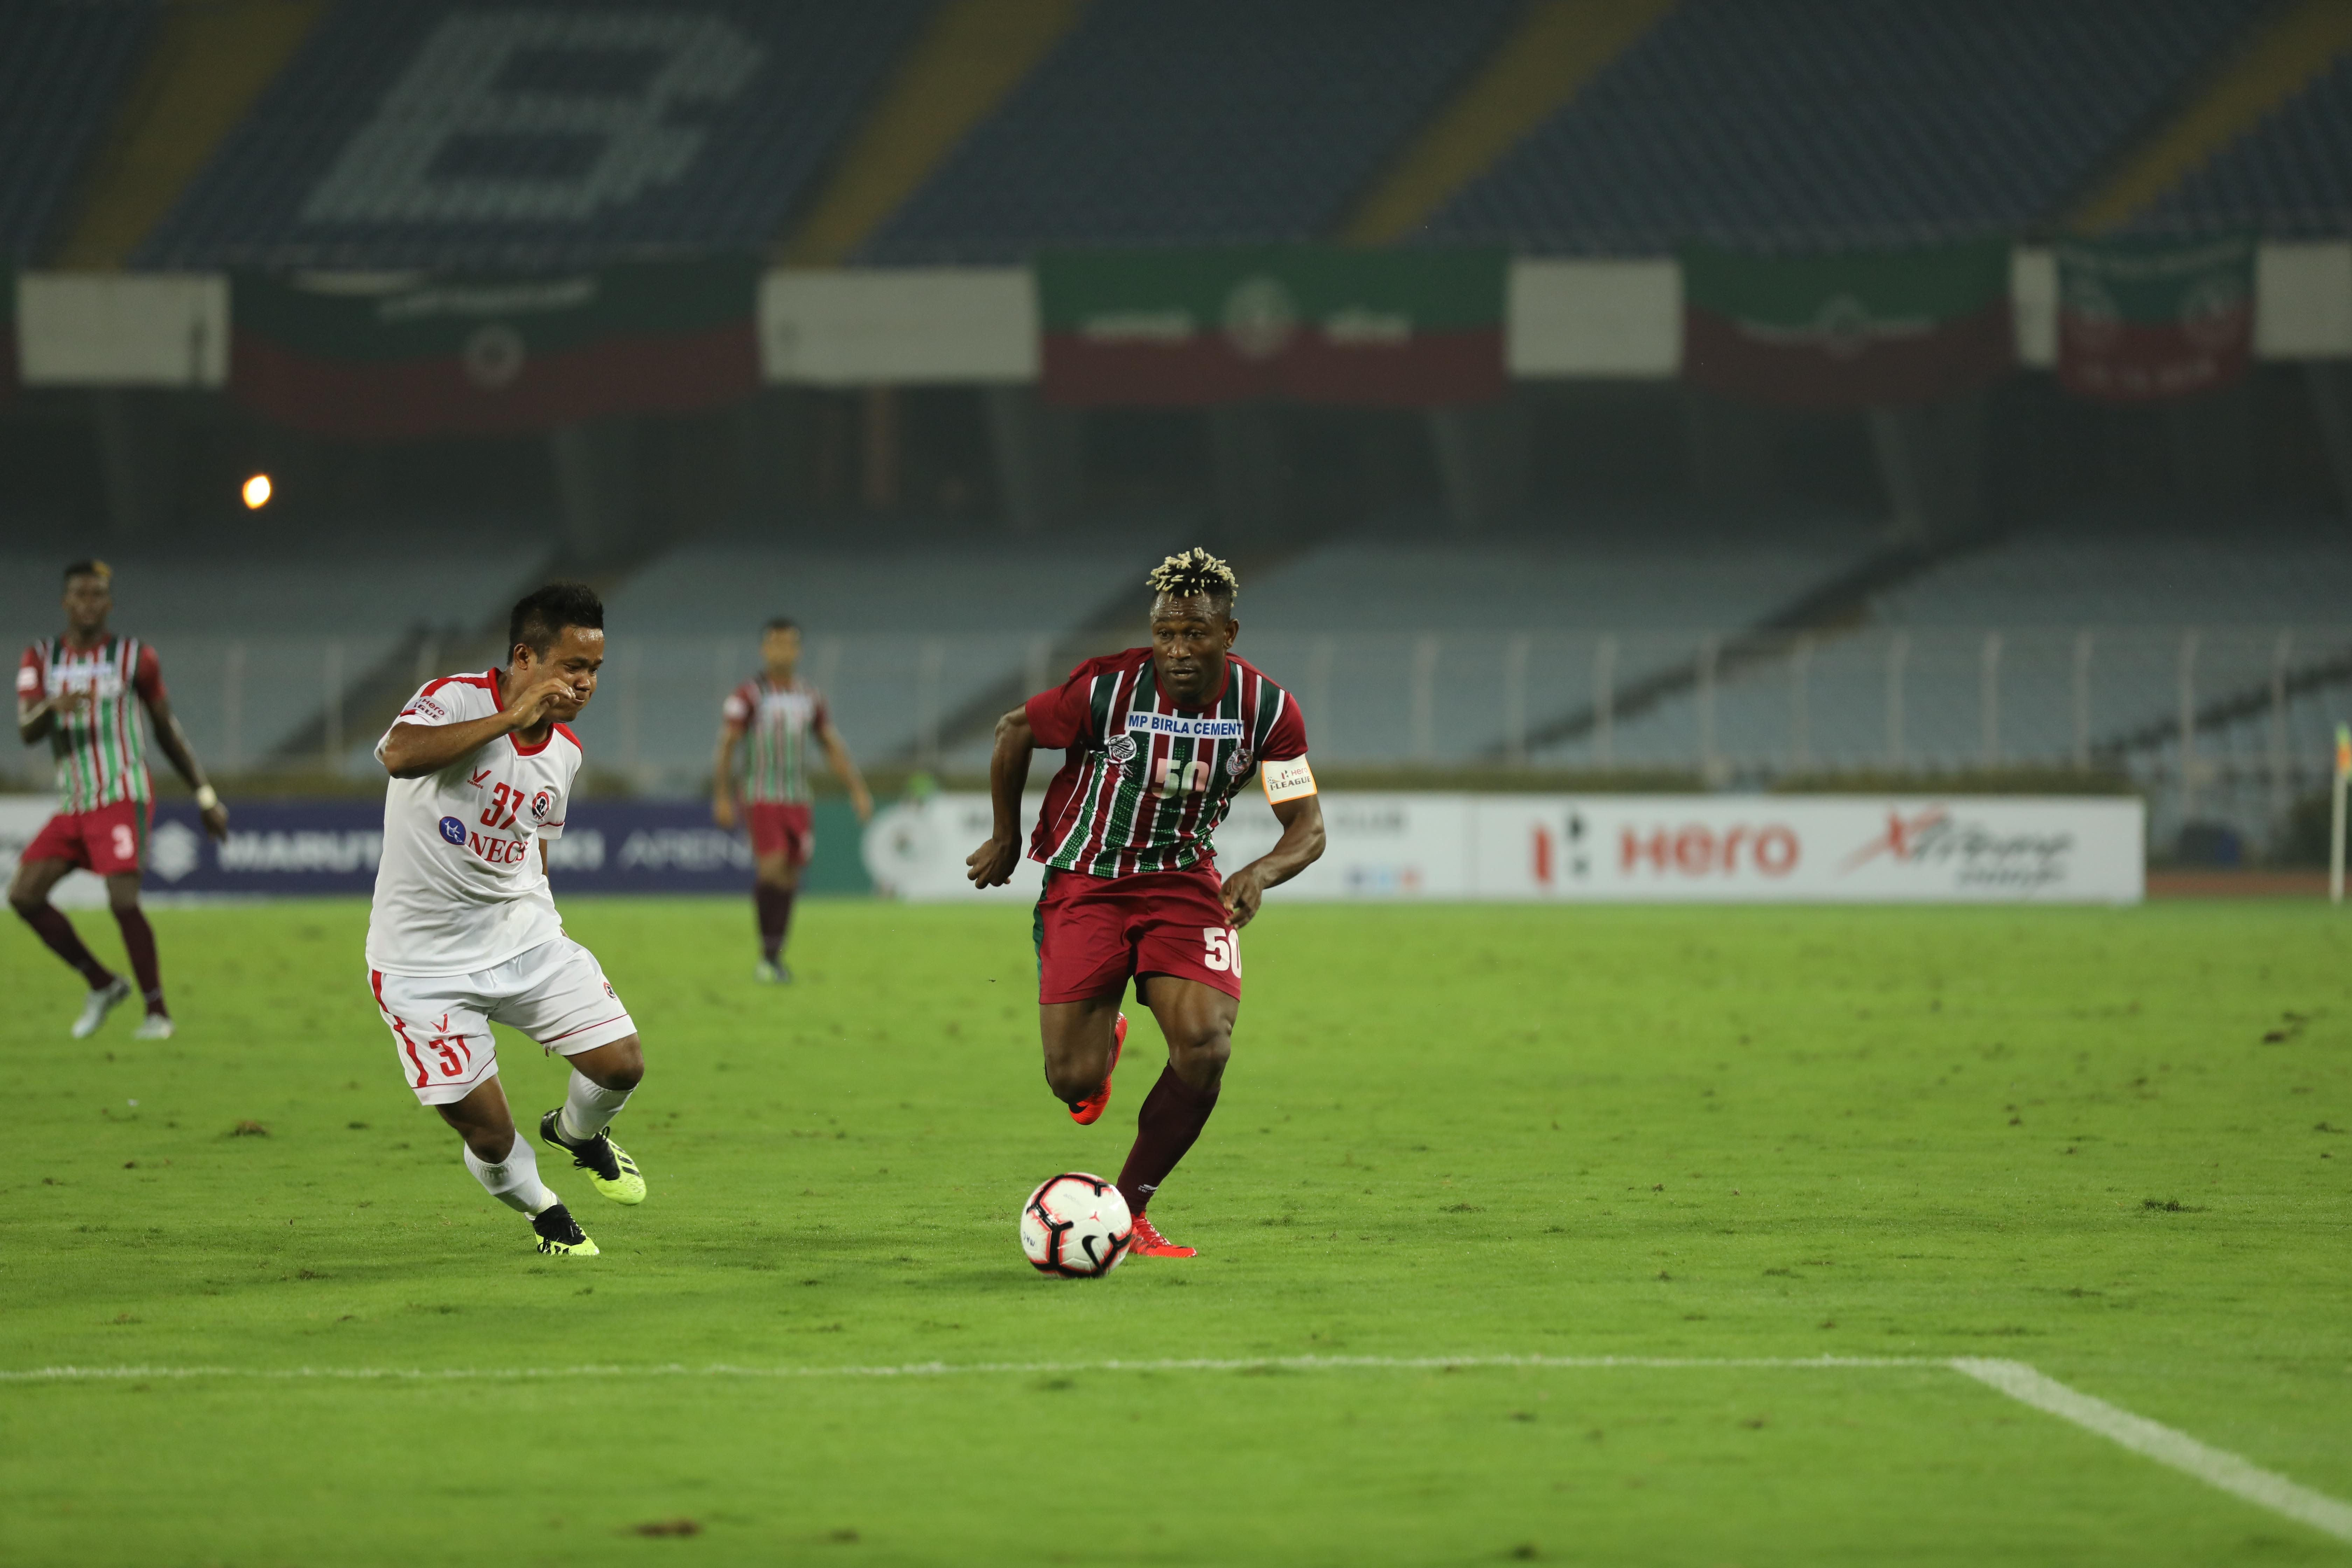 Sony Norde Mohun Bagan Aizawl FC I-League 2018-19